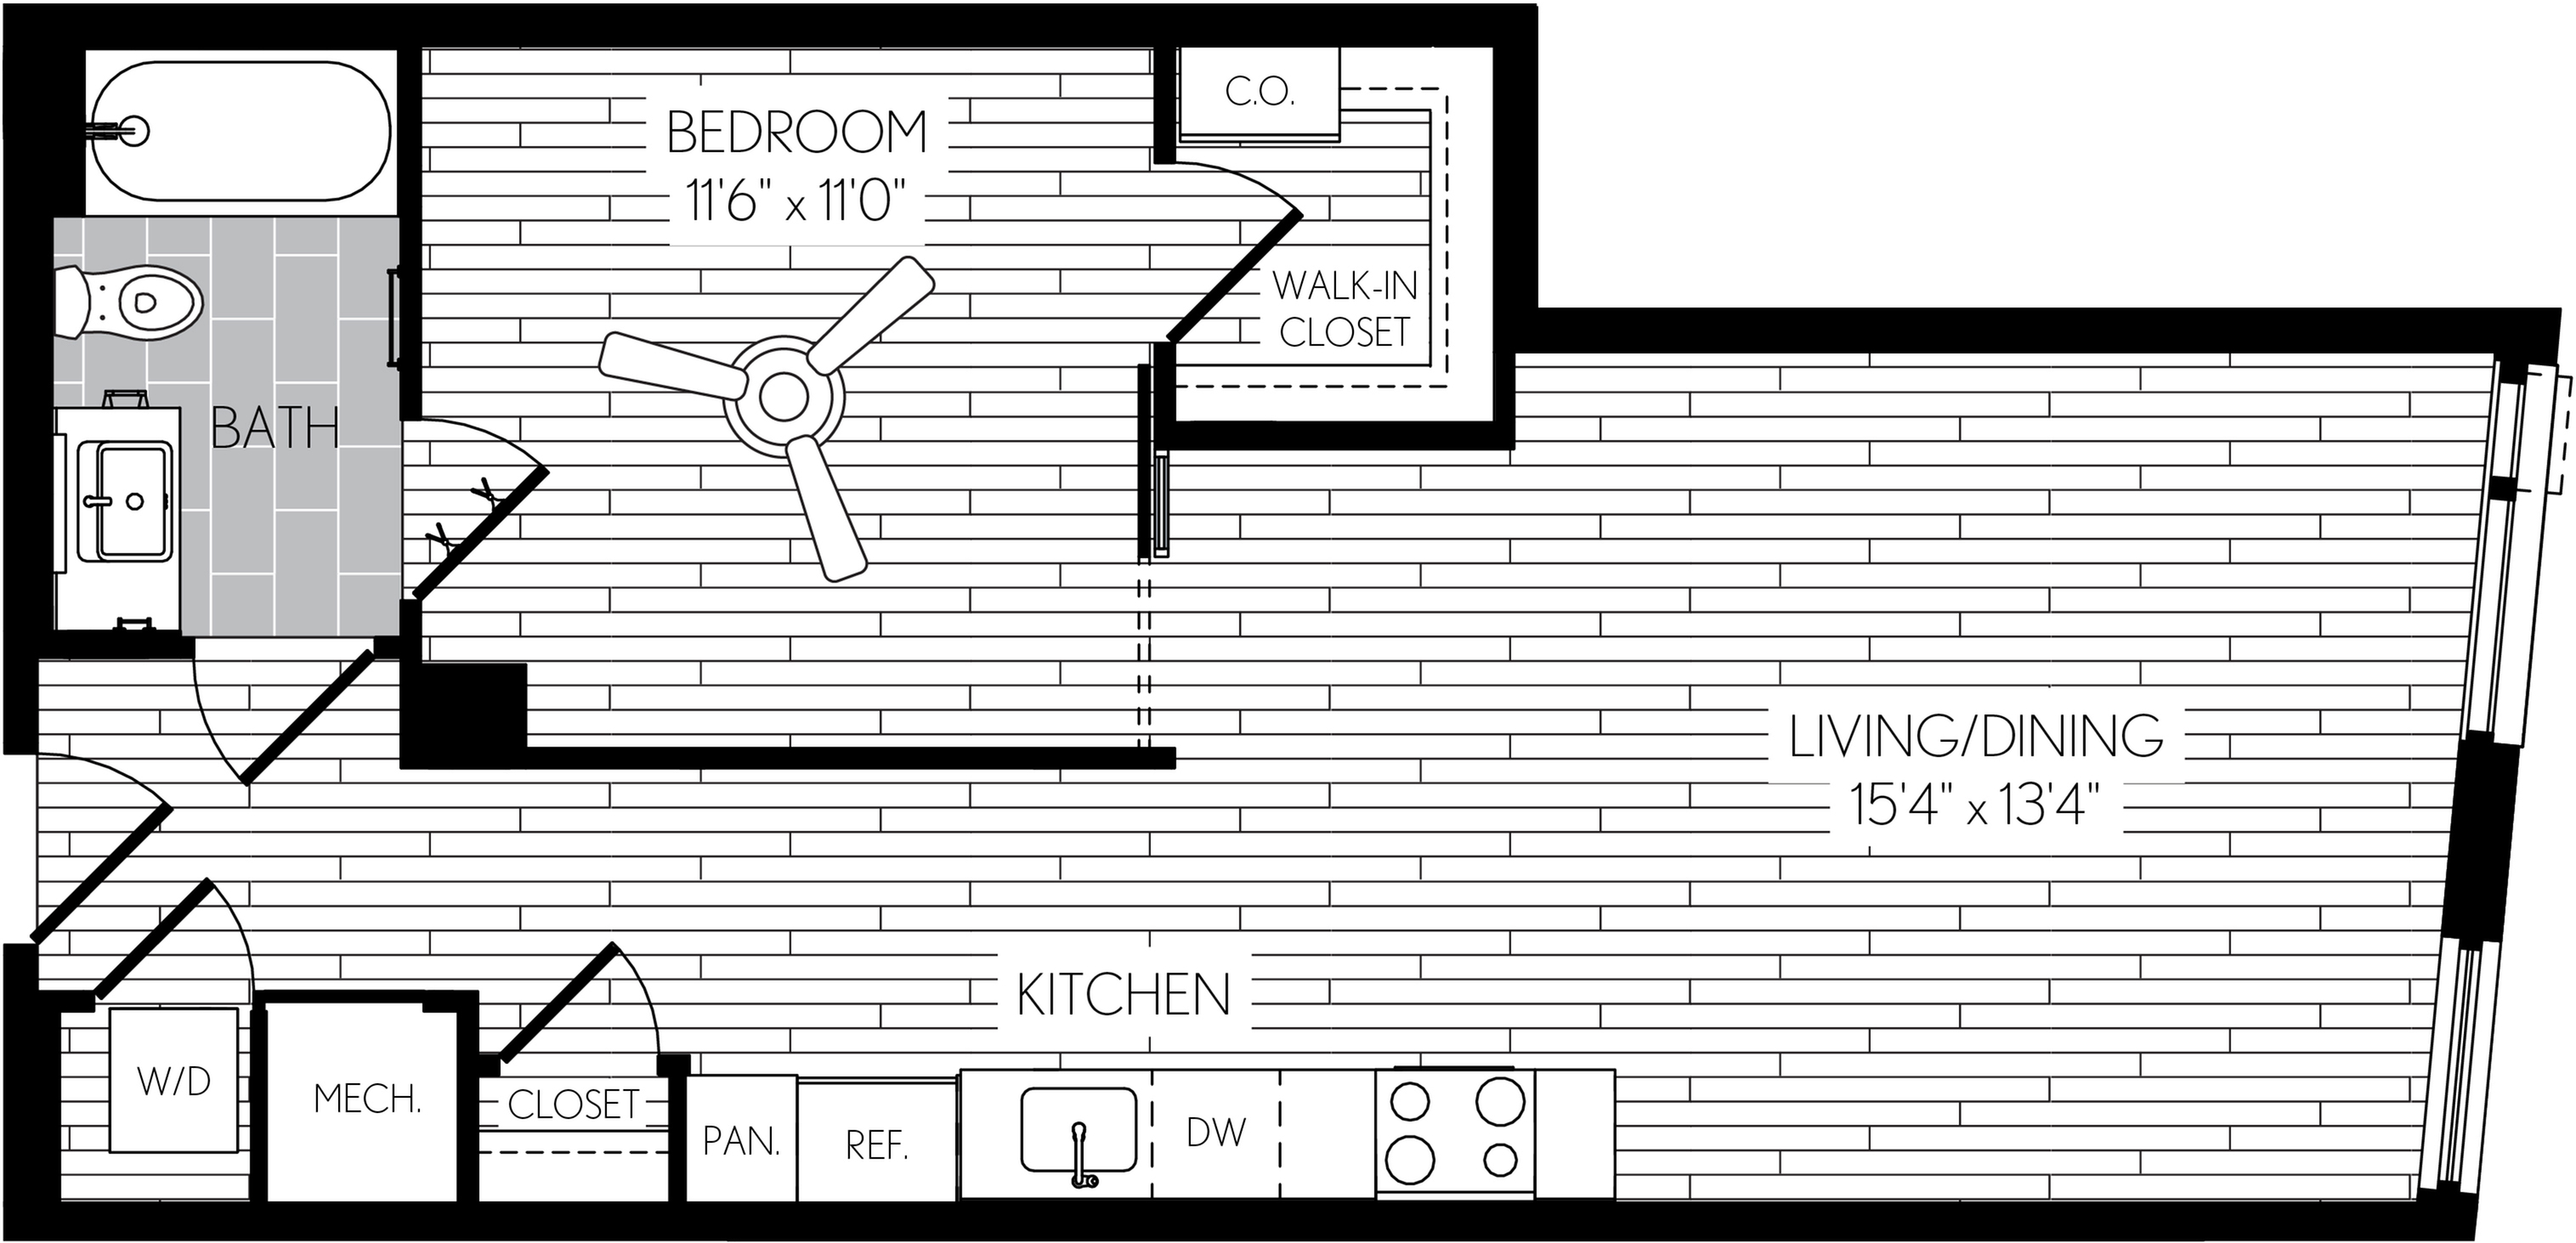 671 square foot one bedroom one bath apartment floorplan image